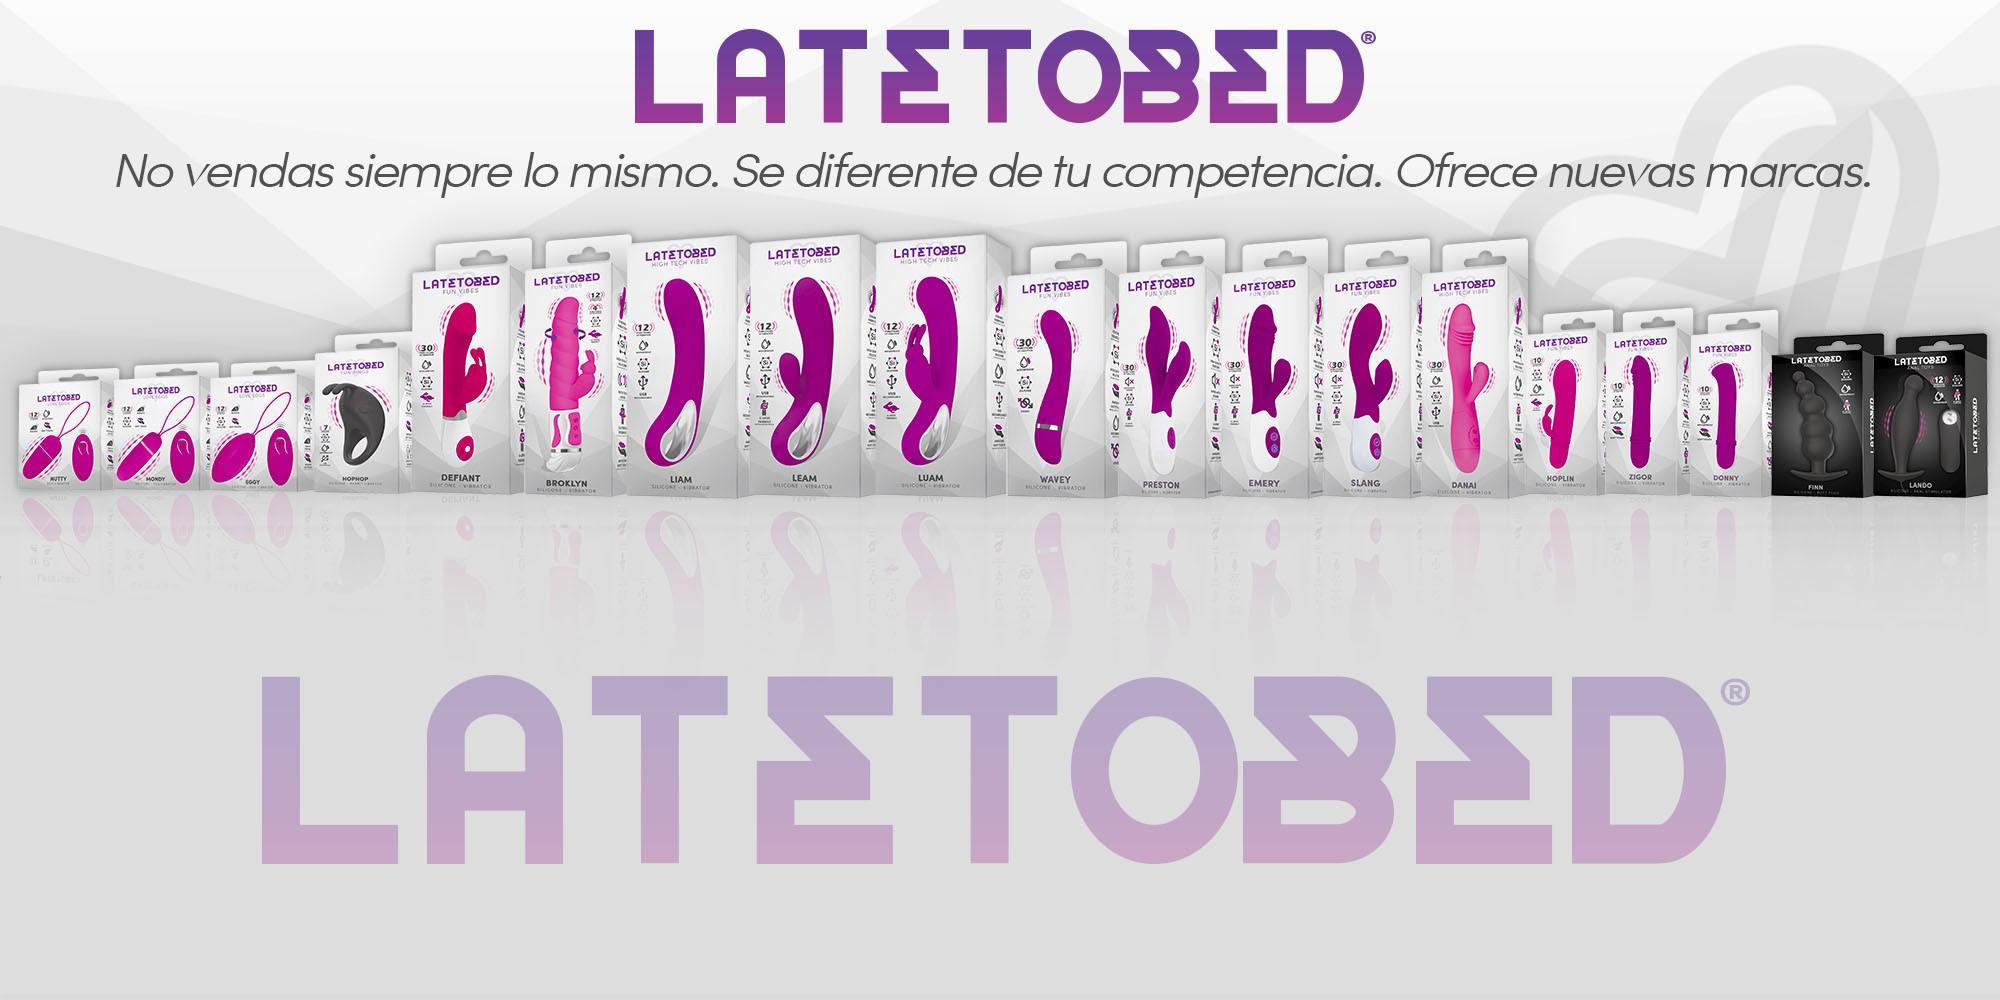 LATETOBED